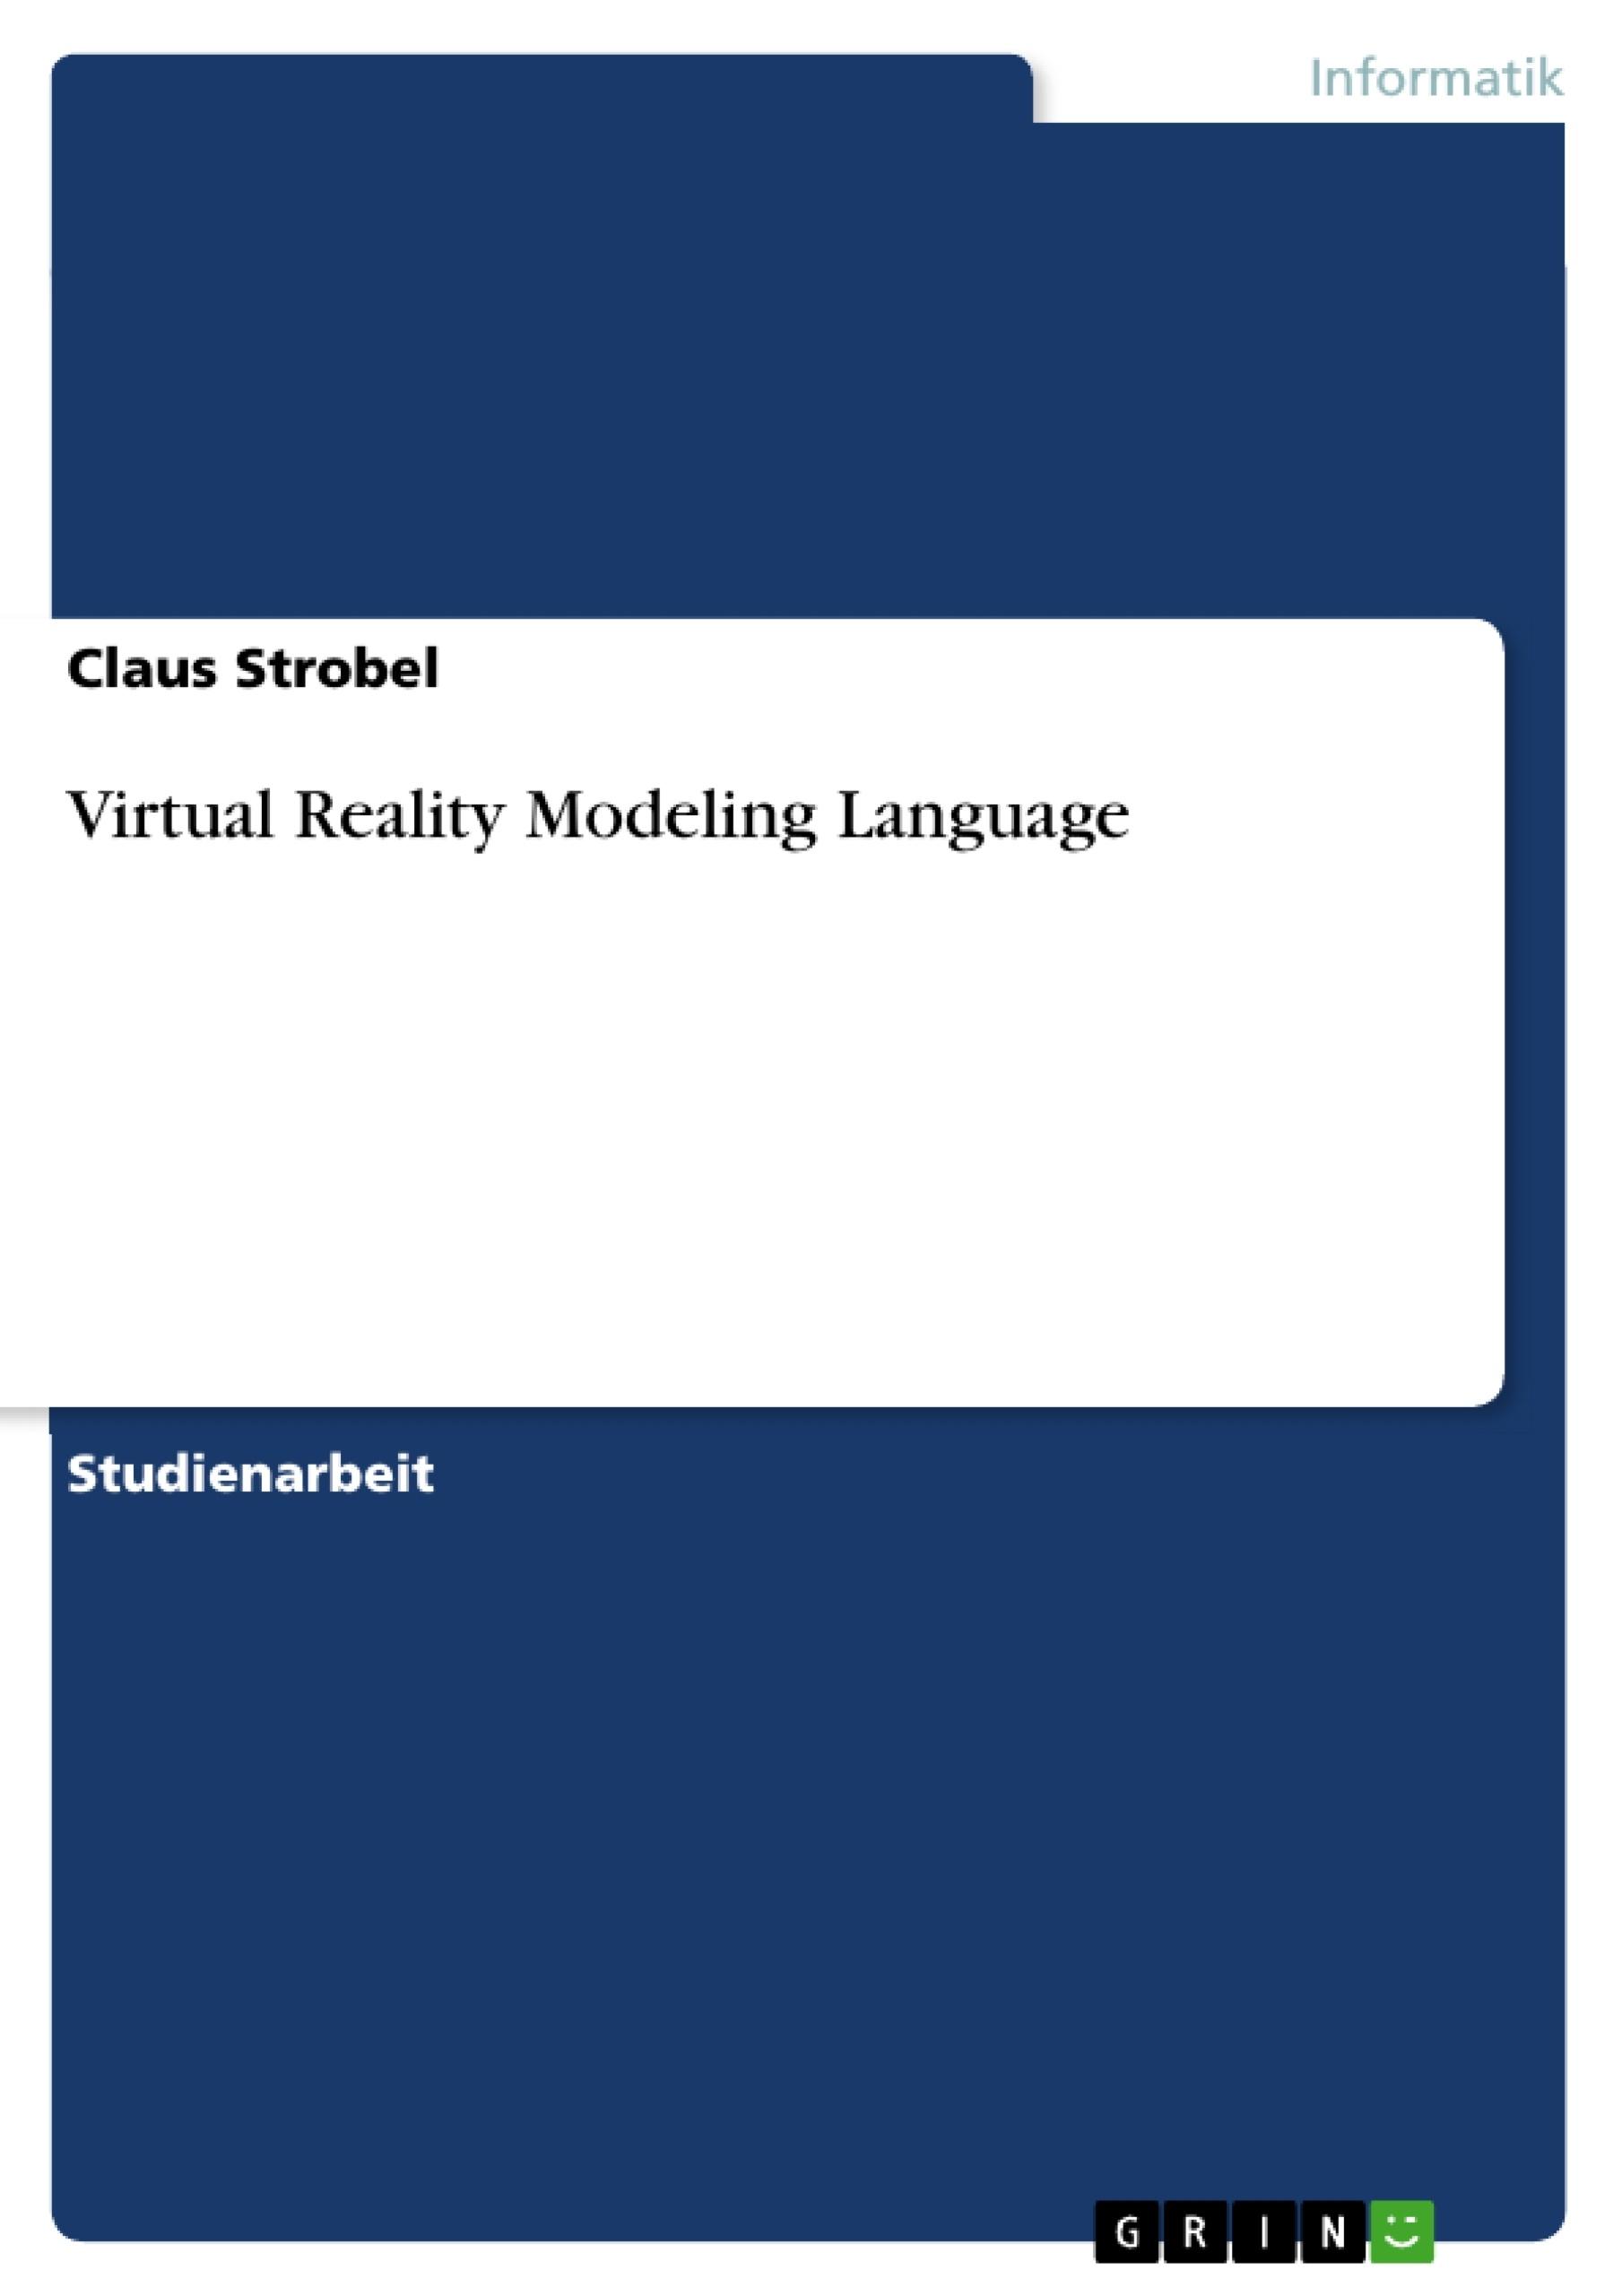 Titel: Virtual Reality Modeling Language